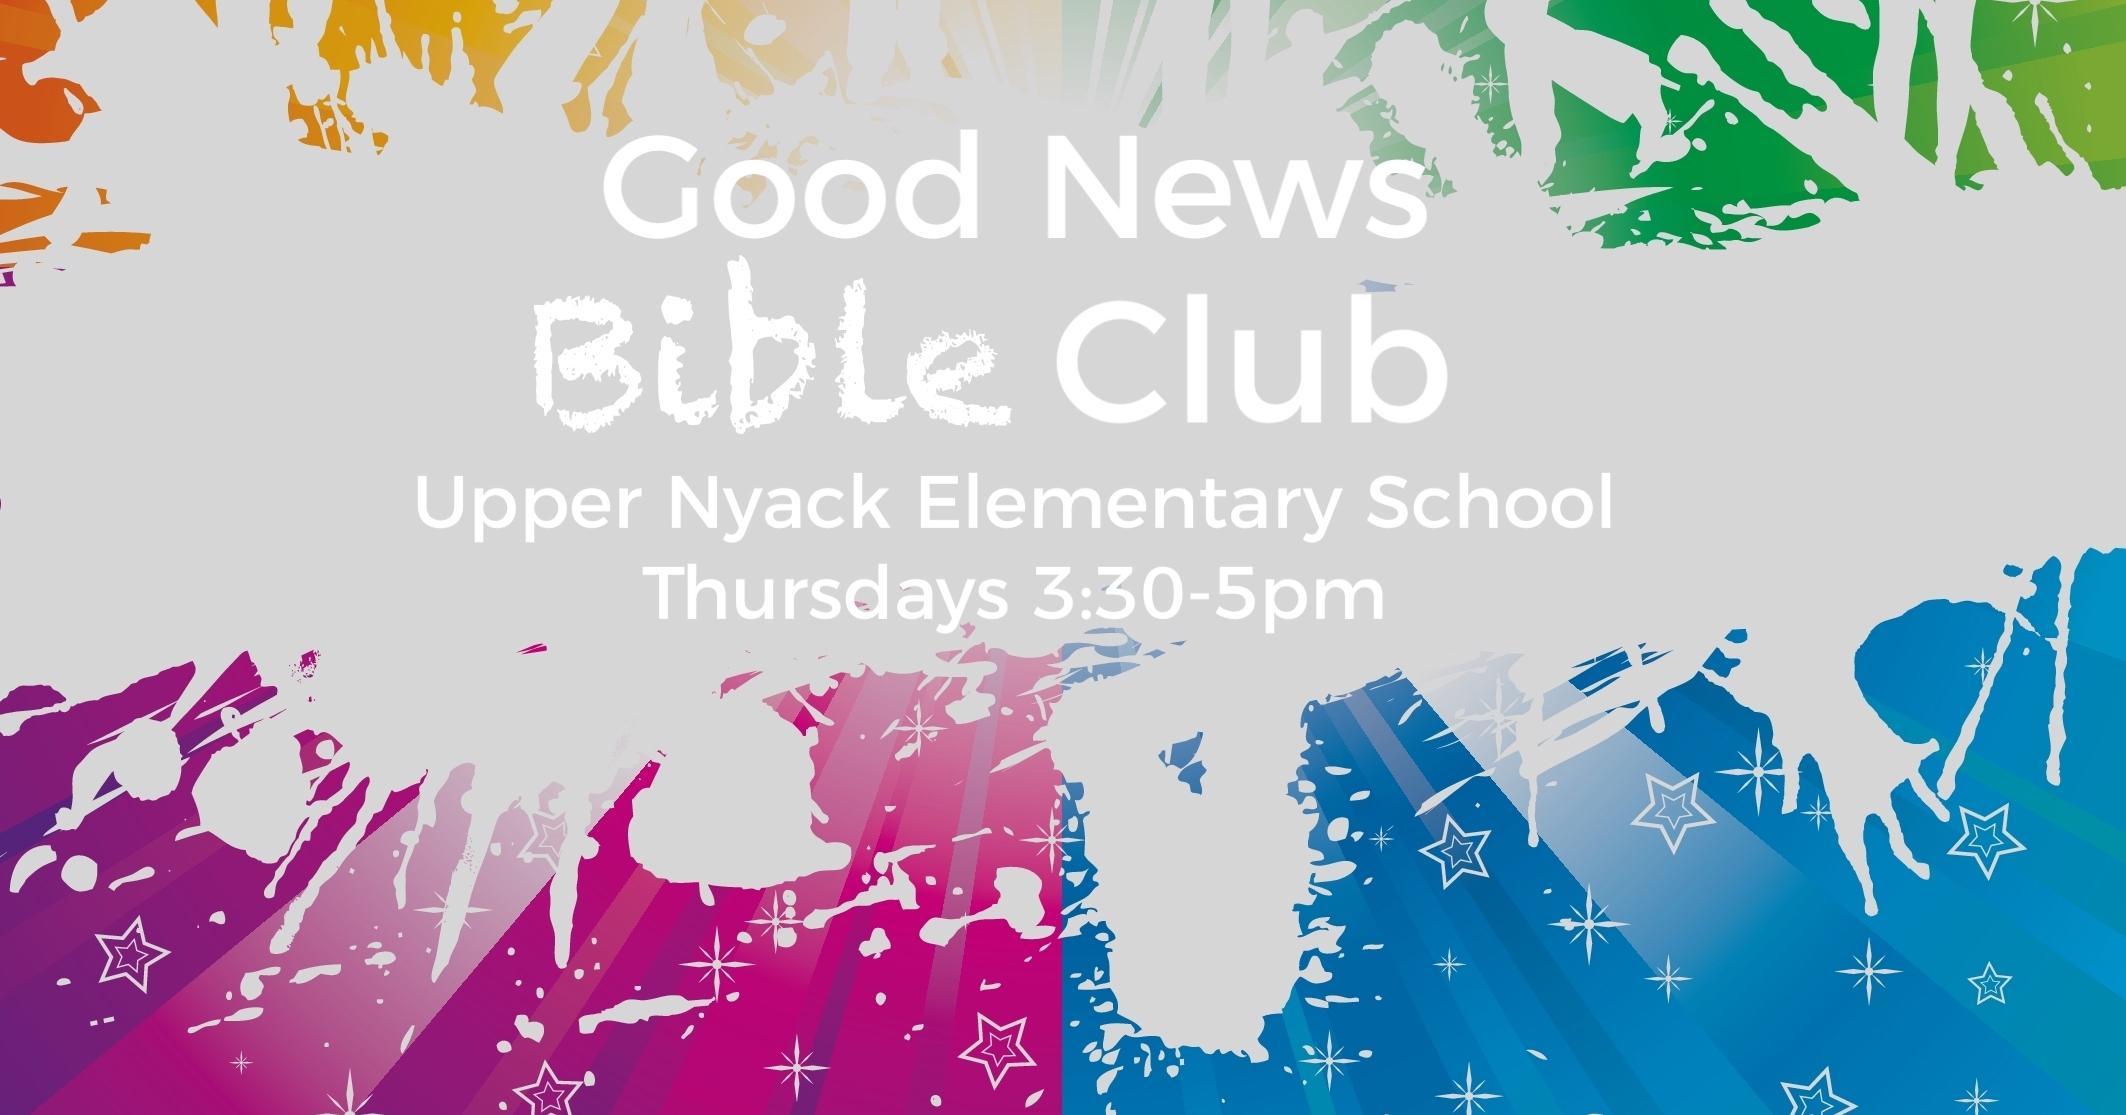 Good News Bible Club @ Upper Nyack Elementary School! THURSDAYS 3:30-5pm